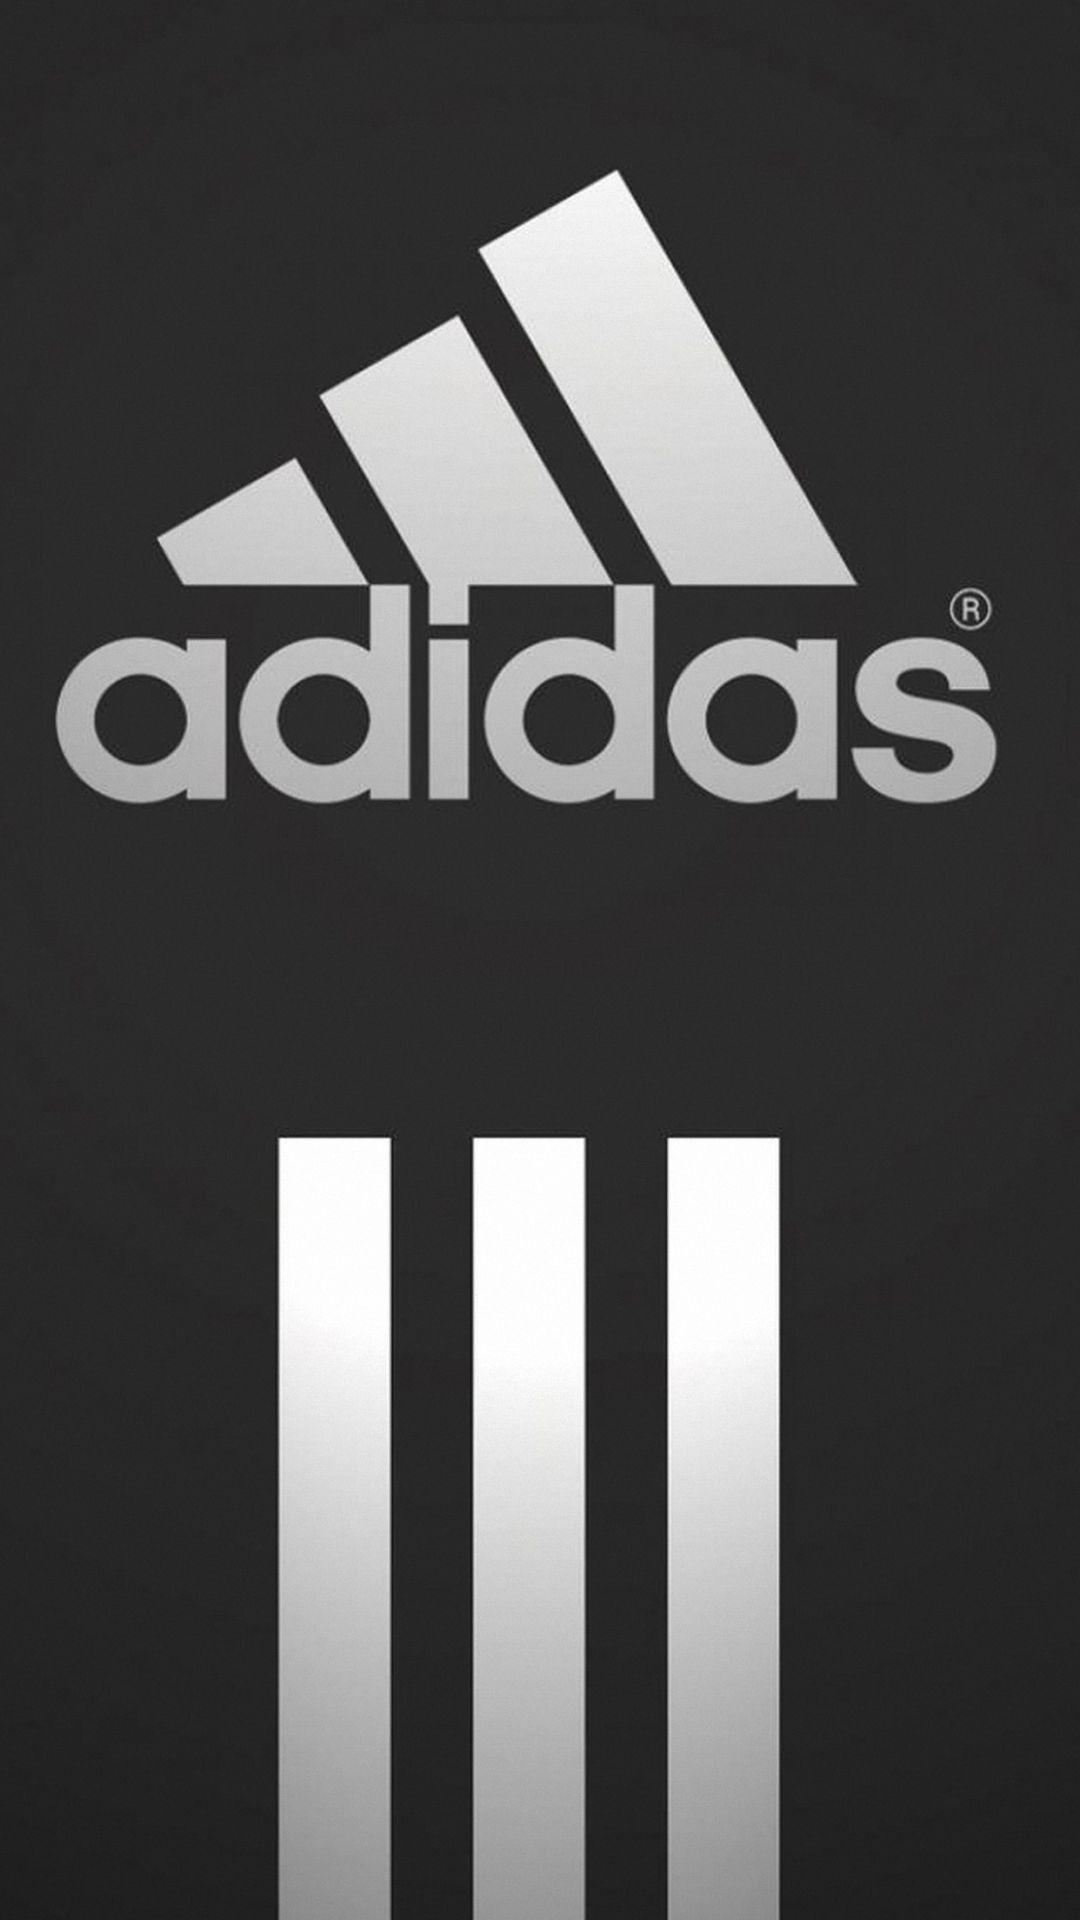 1080x1920 Adidas Logo Iphone 6s Wallpapers Hd Adidas Iphone Wallpaper Adidas Wallpapers Adidas Logo Wallpapers Adidas wallpaper iphone x